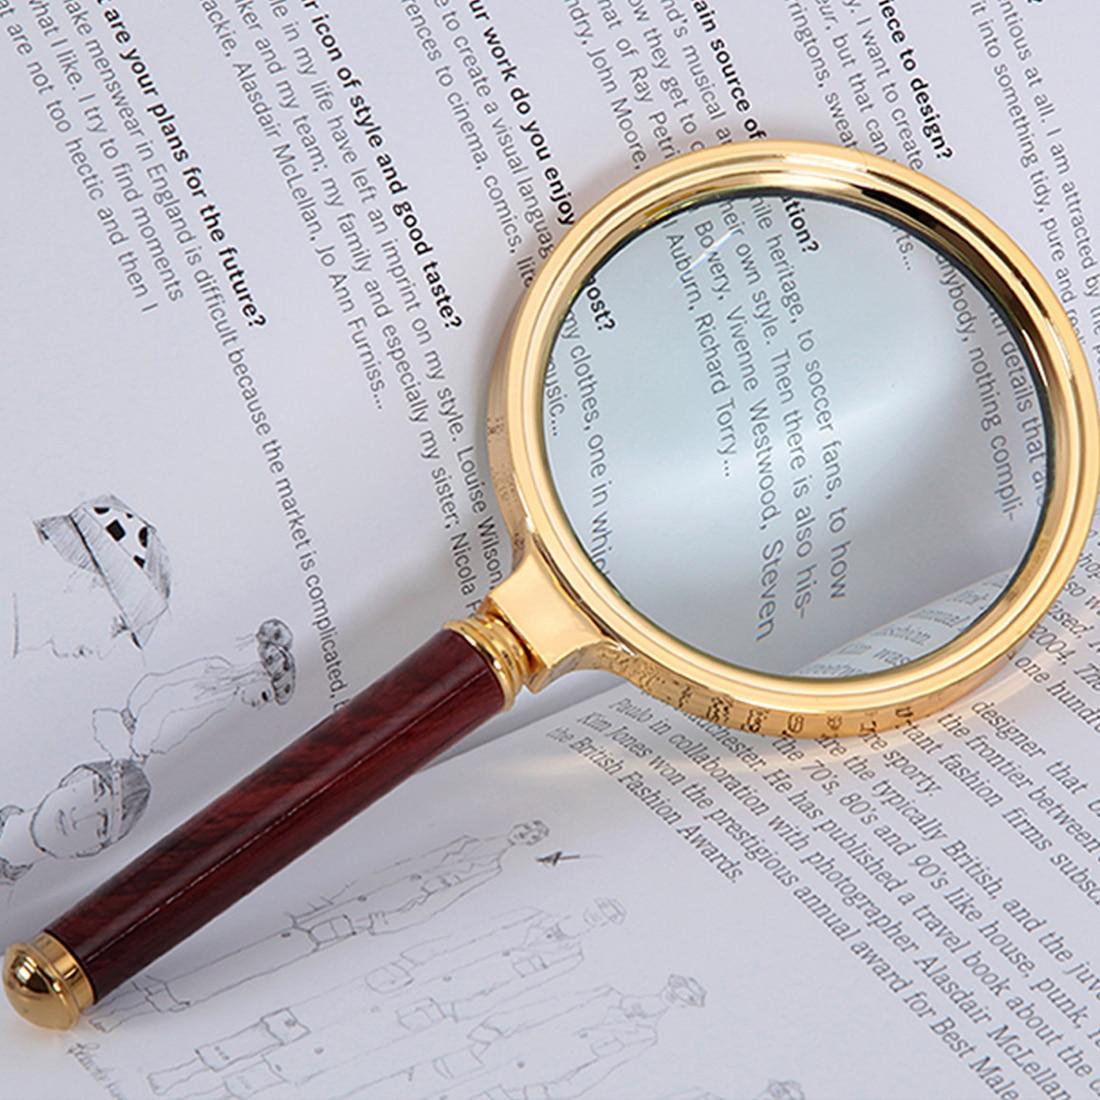 Handheld Magnifier 80mm 10X Reading Eye Loupe Magnifying Glass Magnifier for Reading Jewelry Magnifying Glass цена